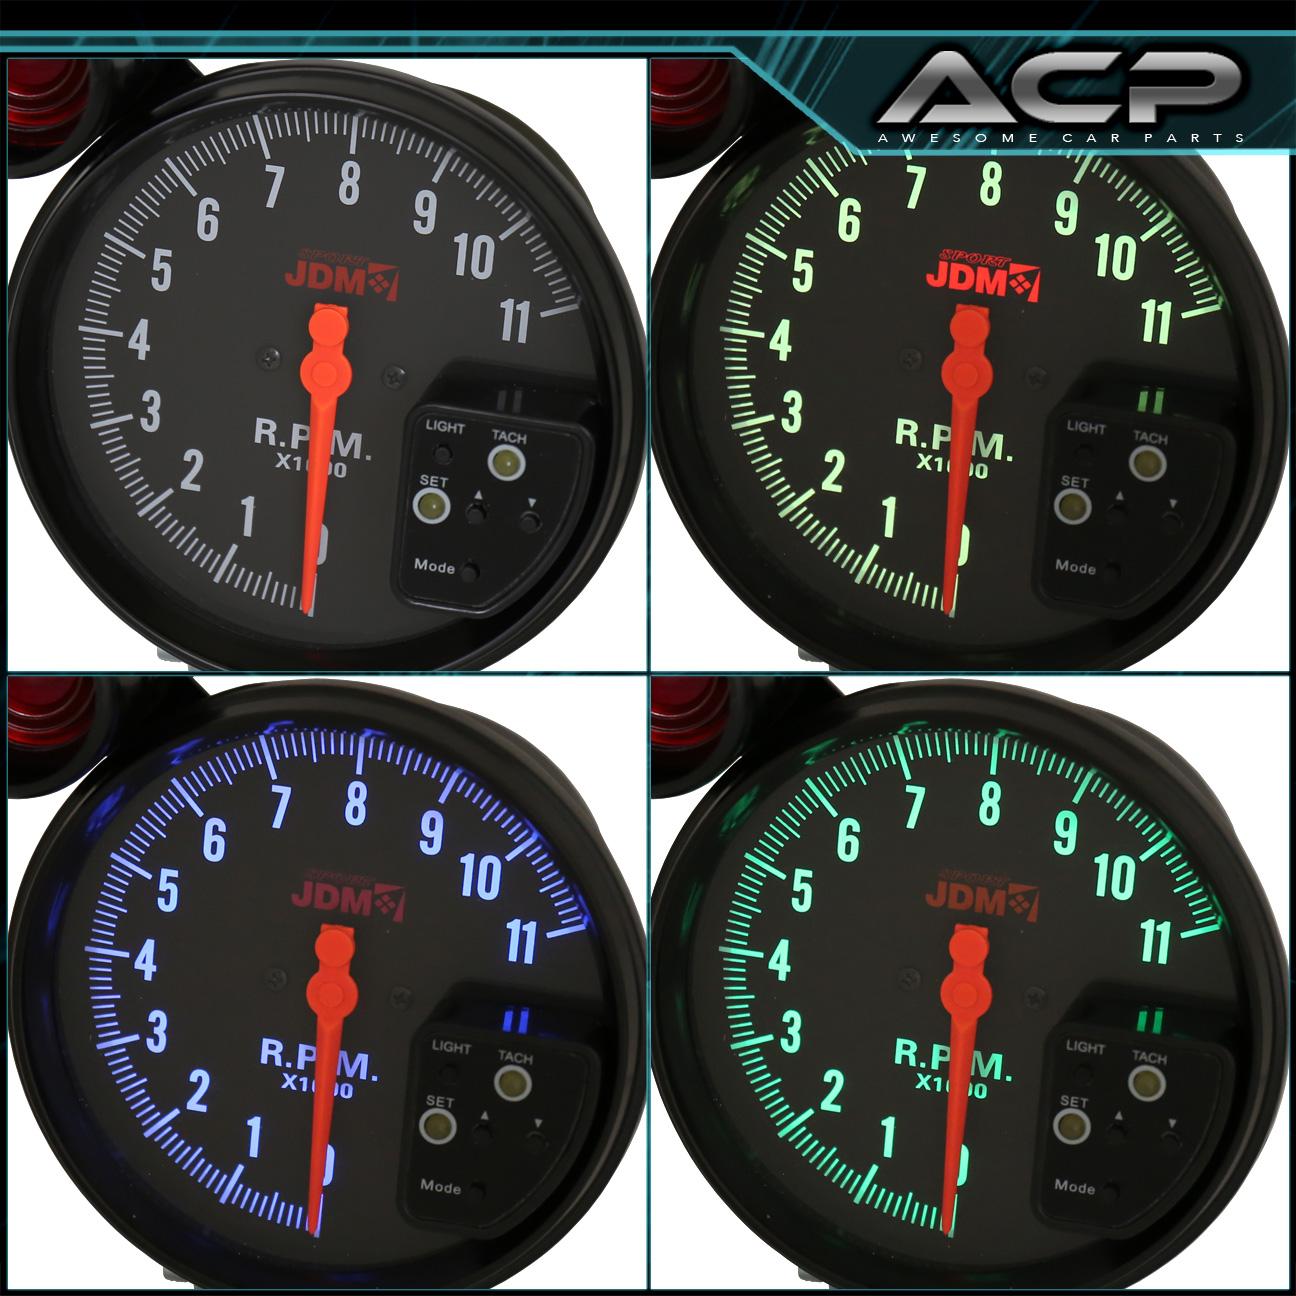 "Rx7 Engine Temp: Performance Race 5"" Tachometer 7 Led Display + Shift Light"